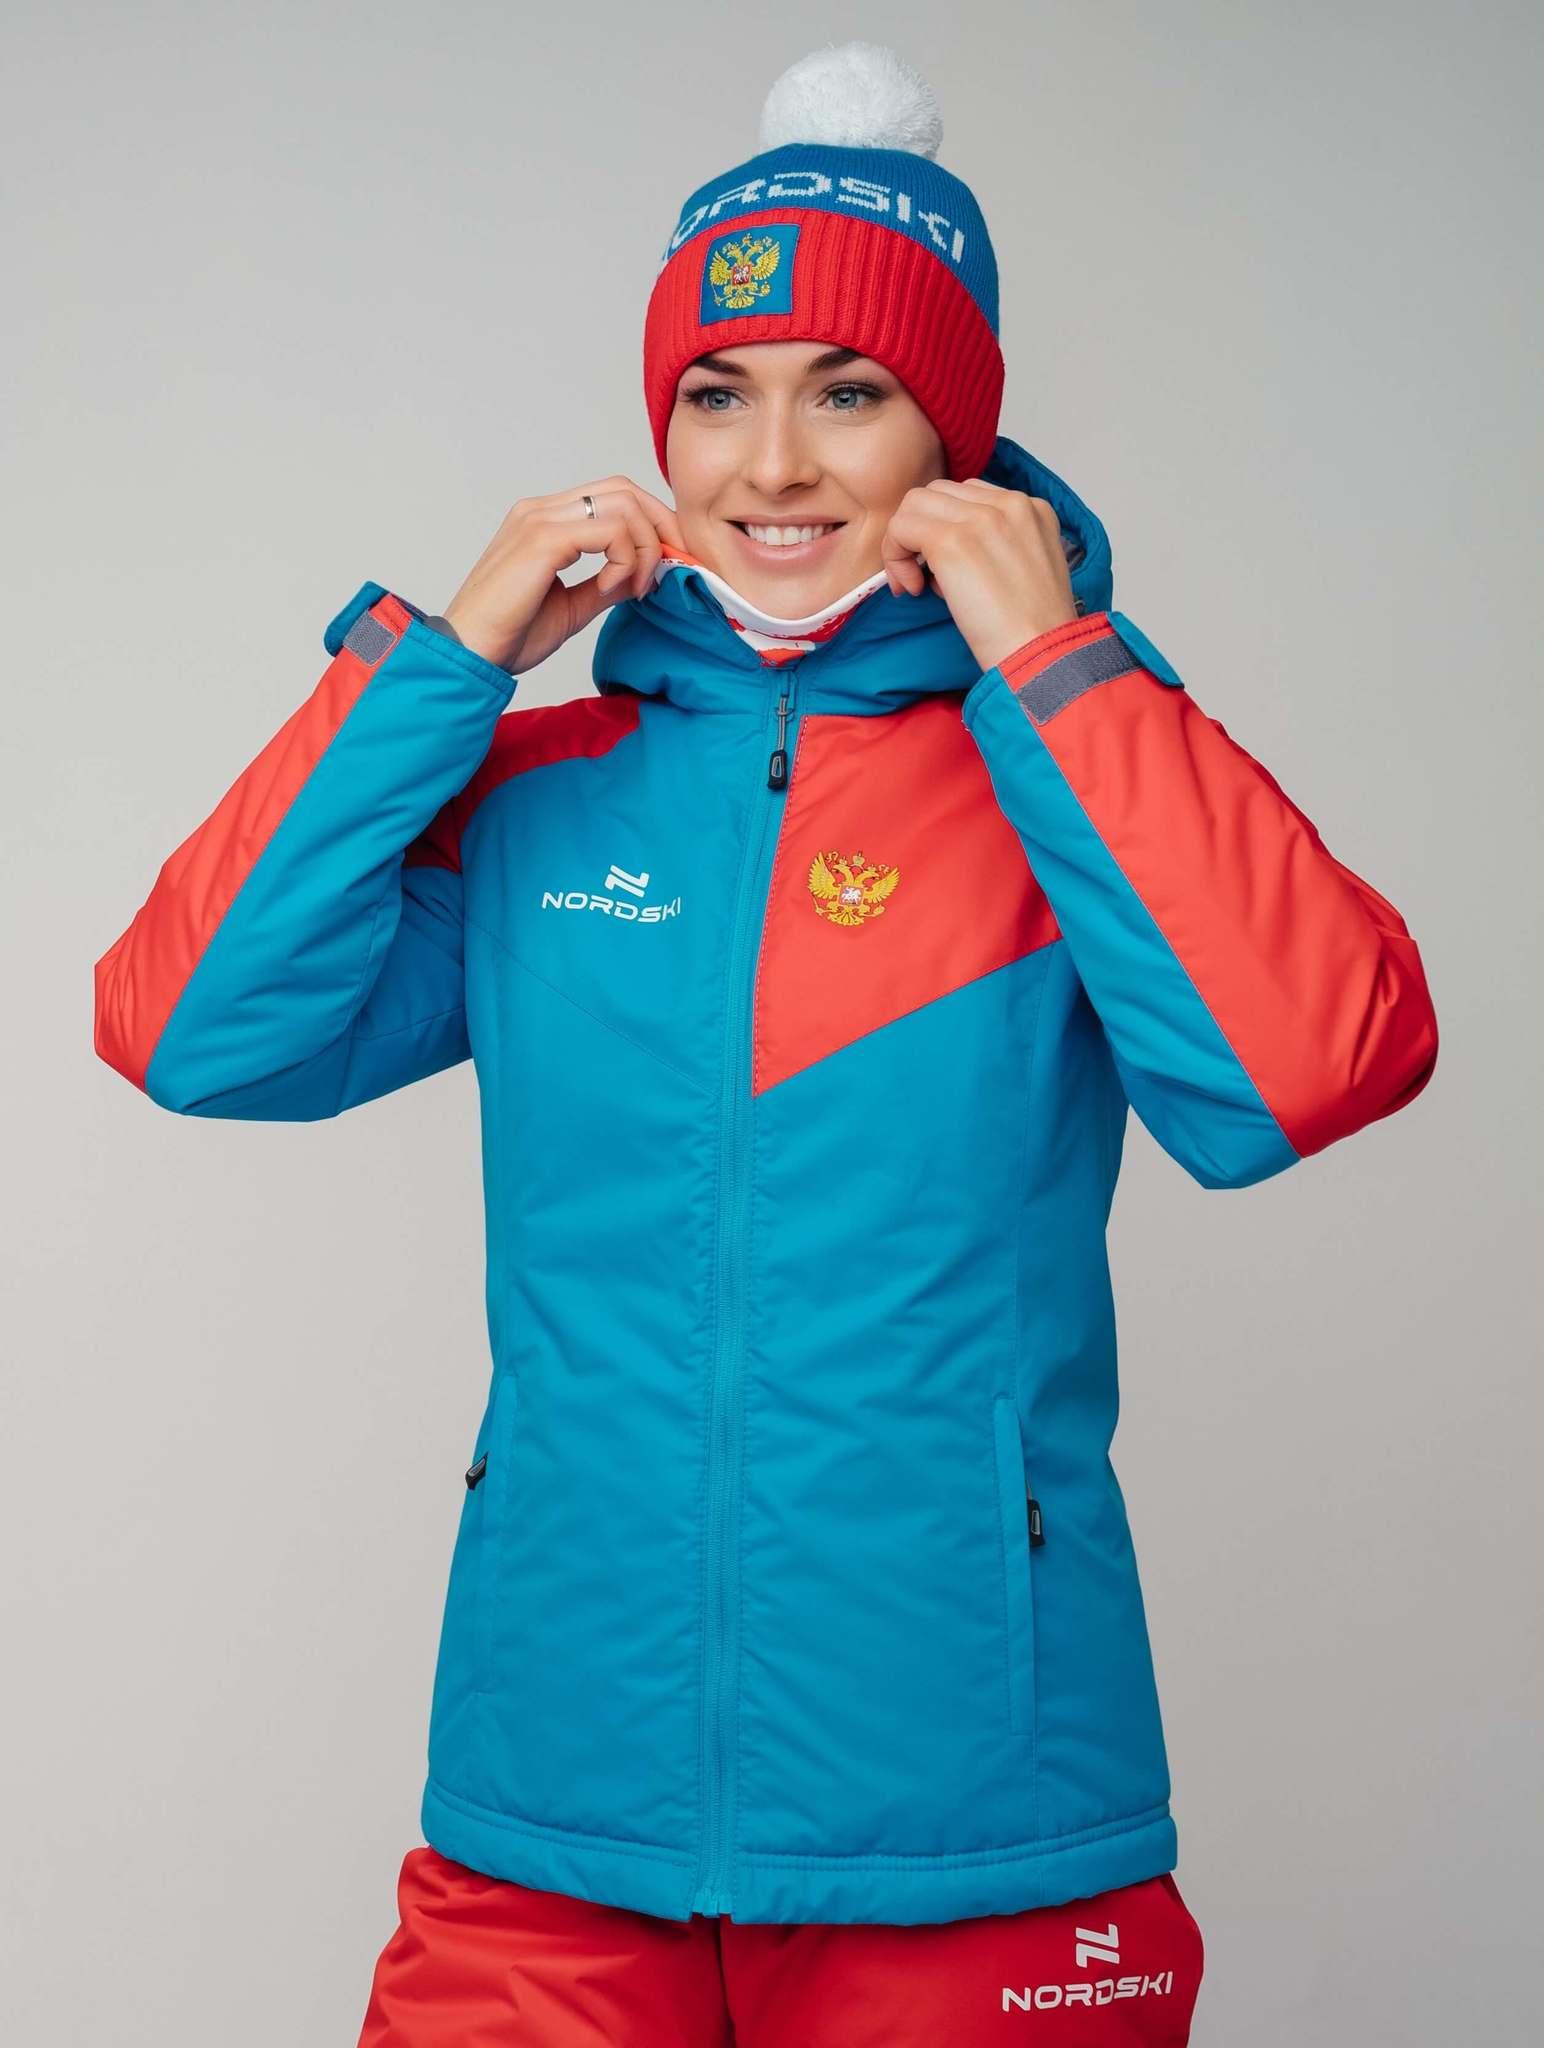 Nordski National 2.0 женская утепленная лыжная куртка - 3